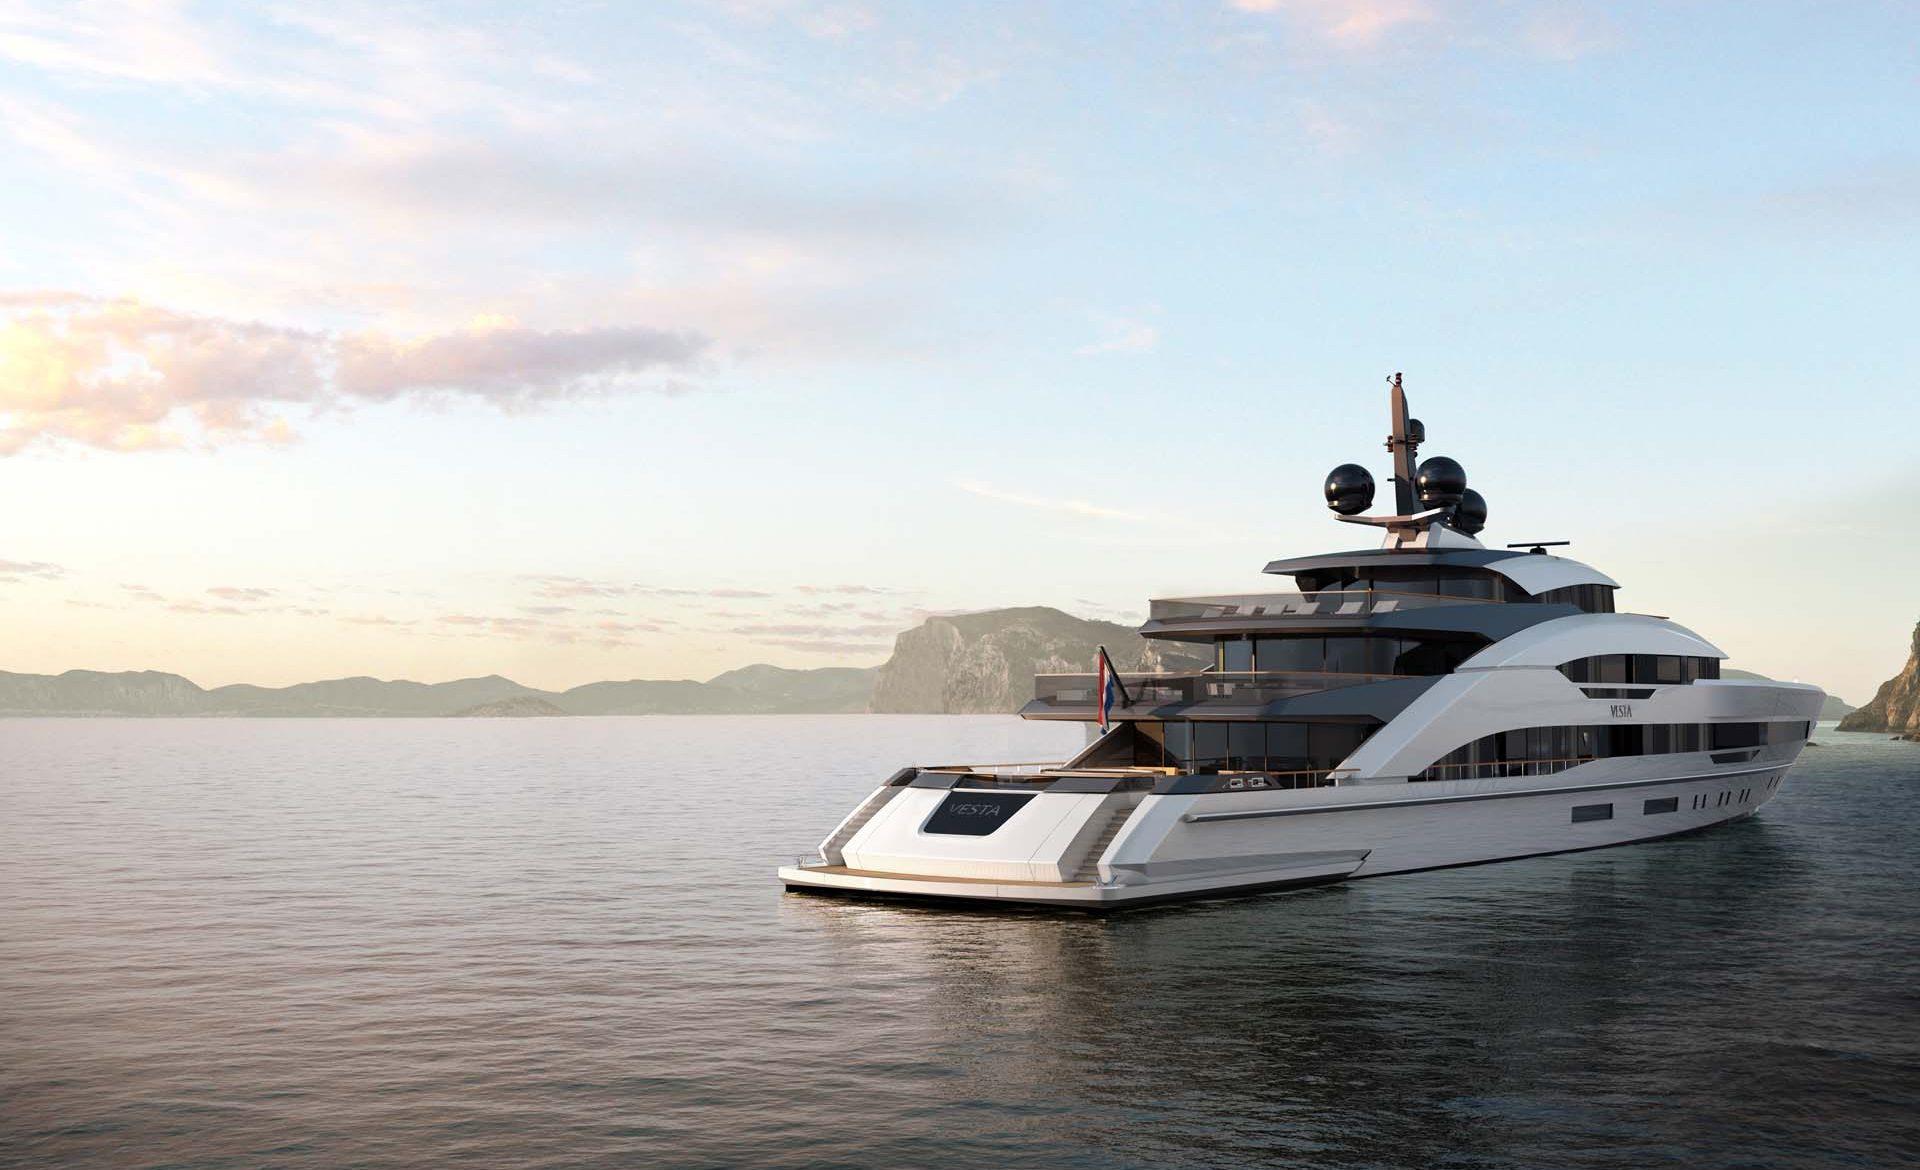 Superyacht Sunday: Meet the Largest Heesen Yacht - Project